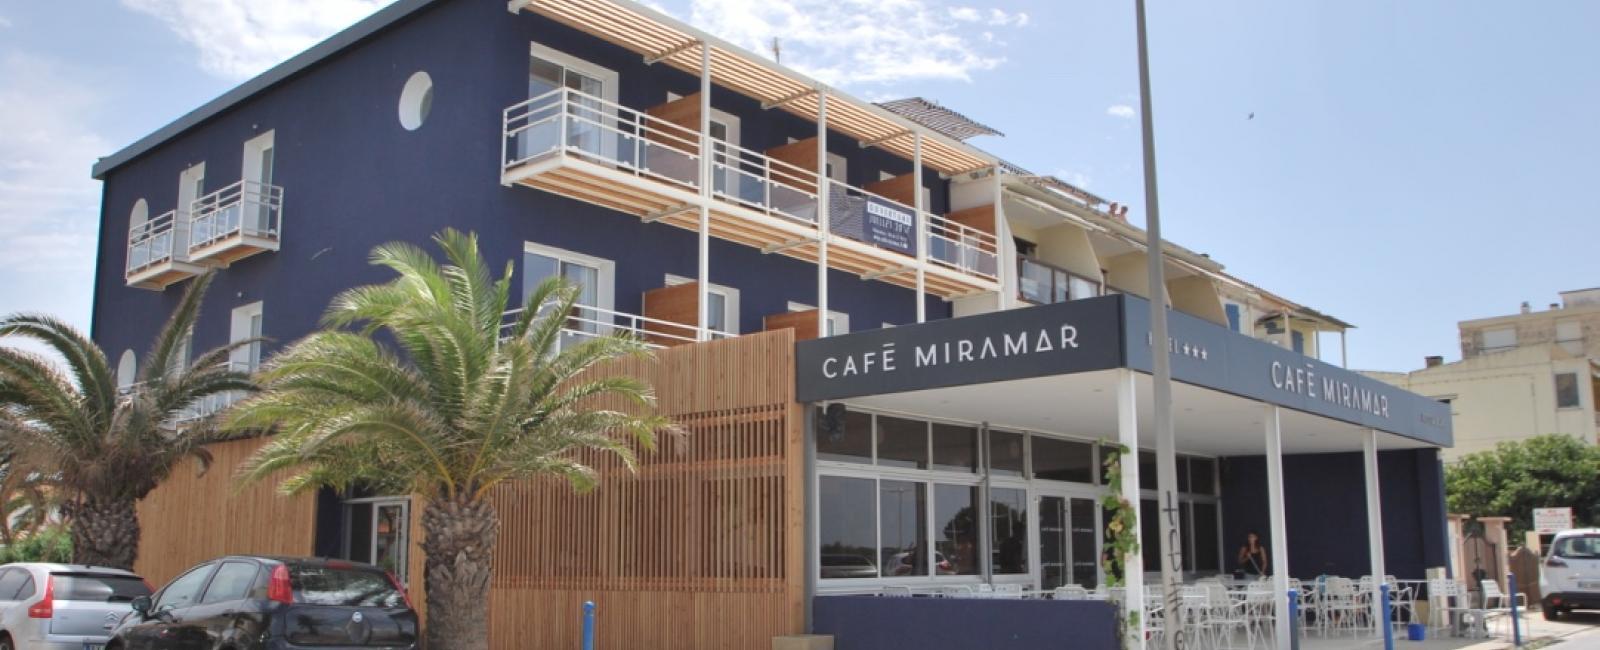 "RÉHABILITATION HOTEL RESTAURANT ""CAFÉ MIRAMAR"" AU GRAU DU ROI"